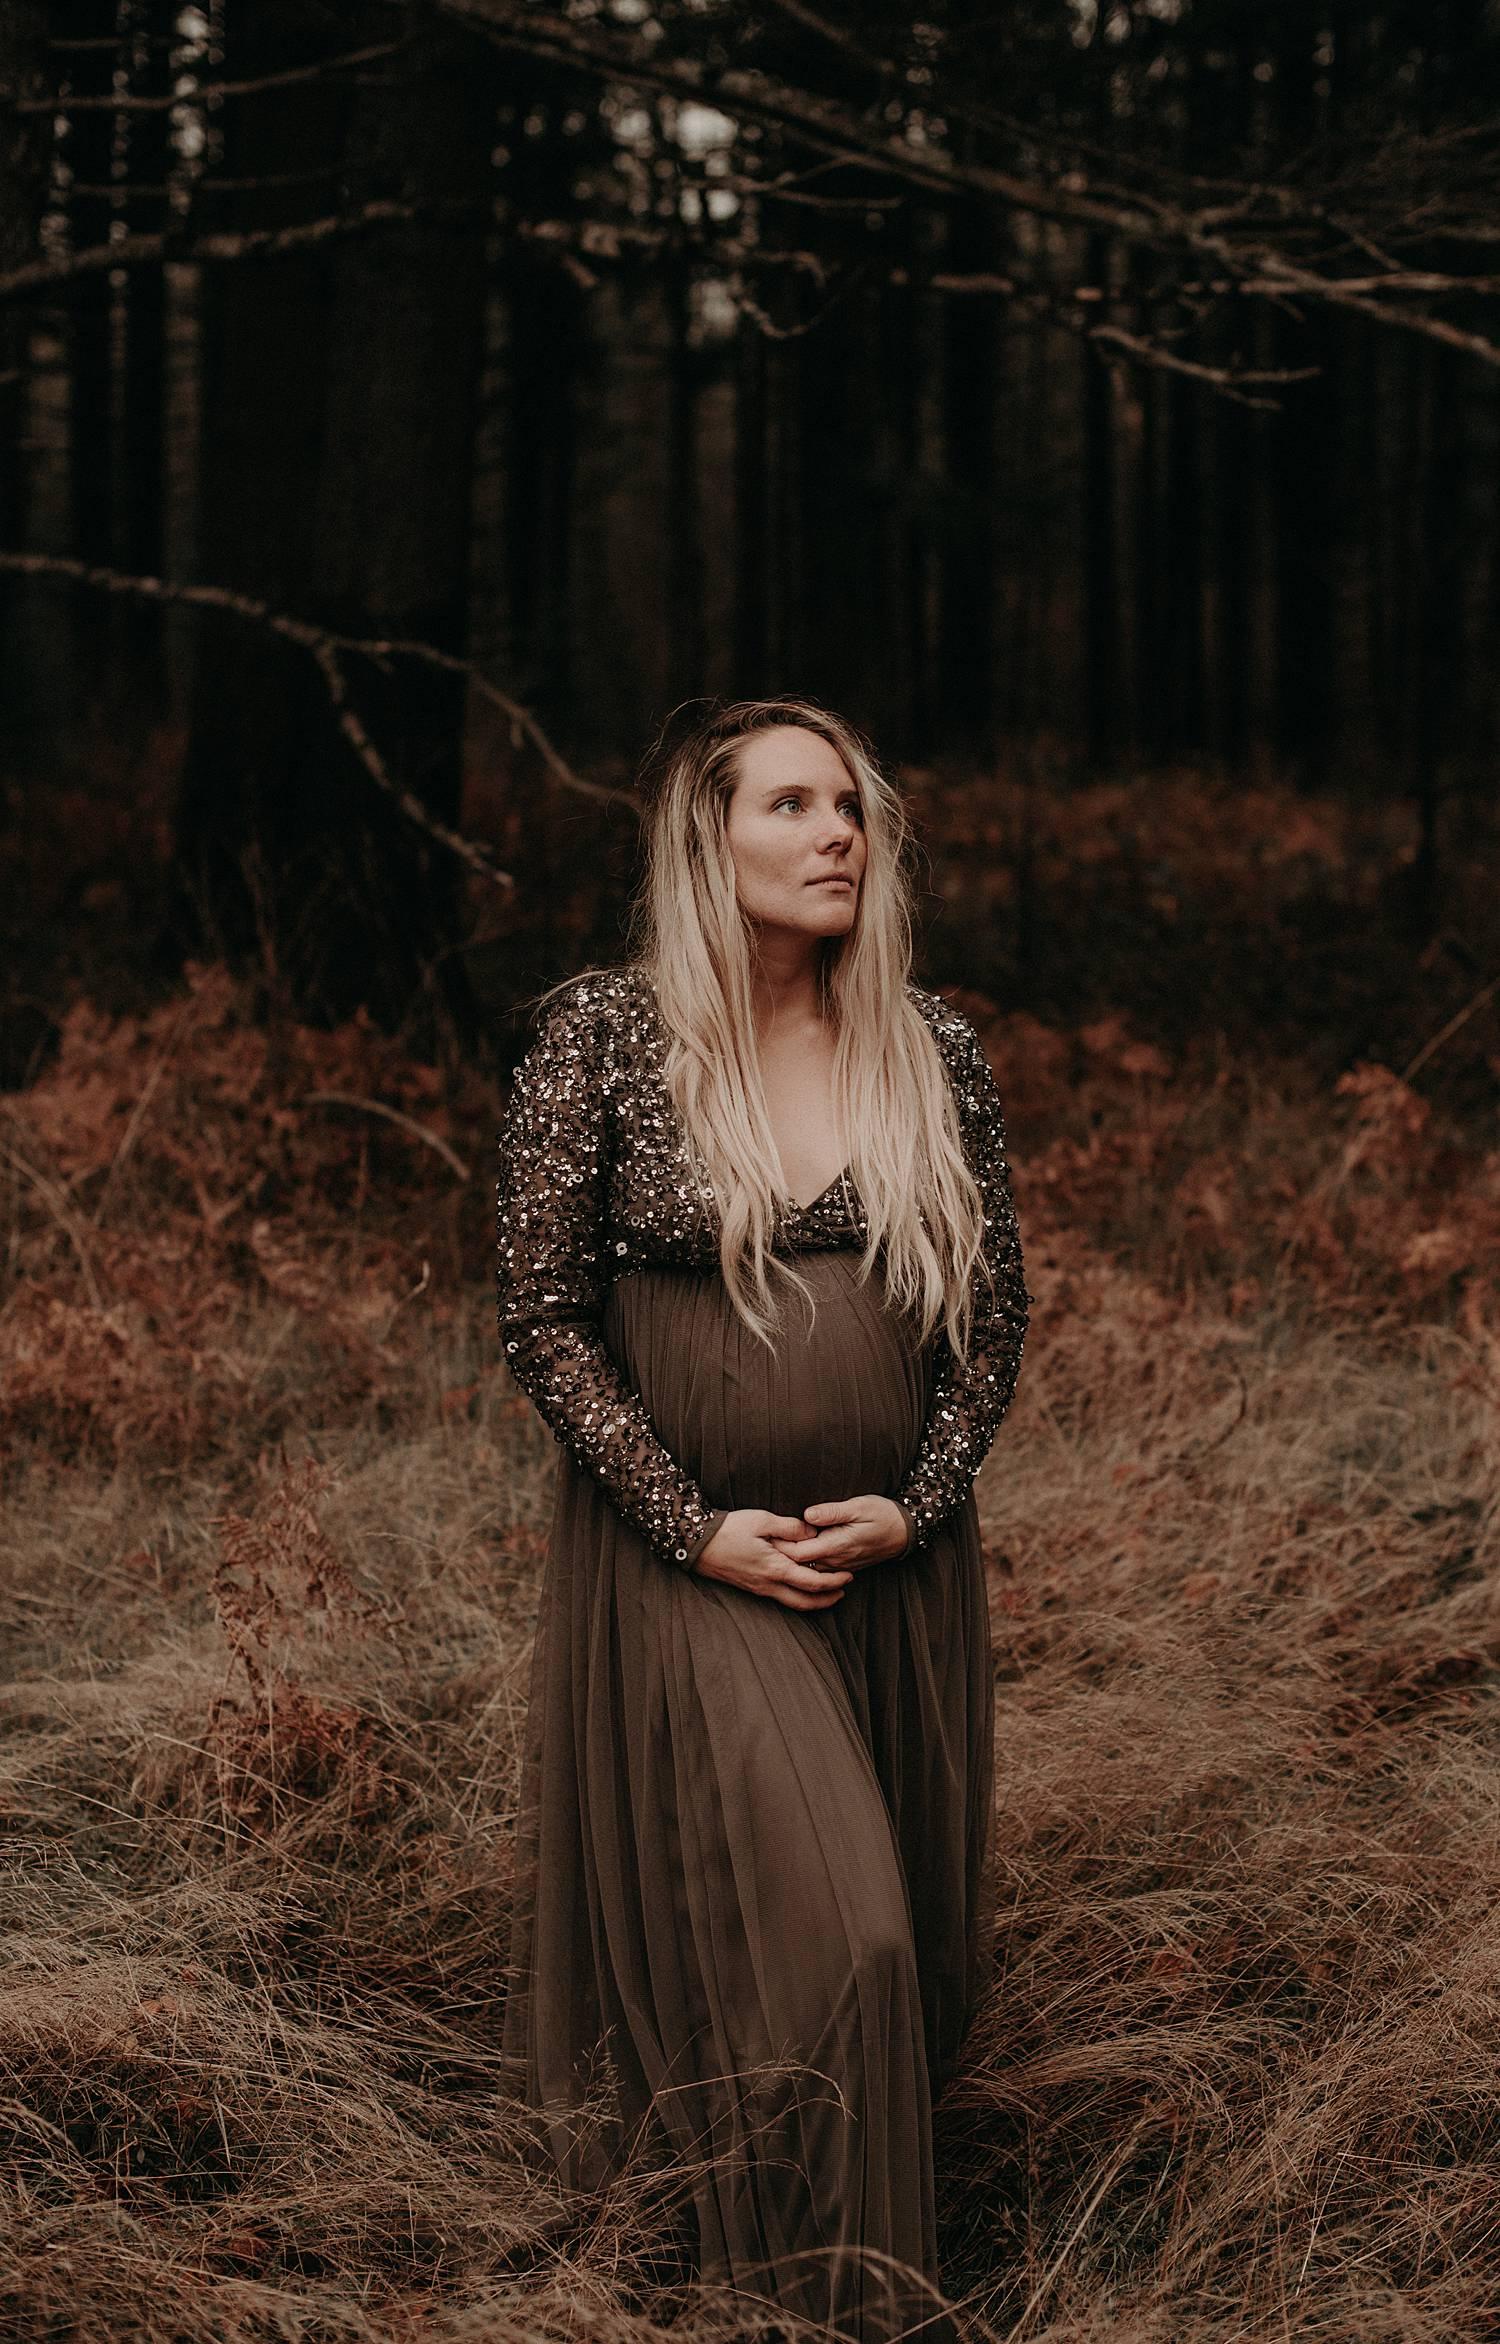 Oregon_maternity_photos_1212.jpg